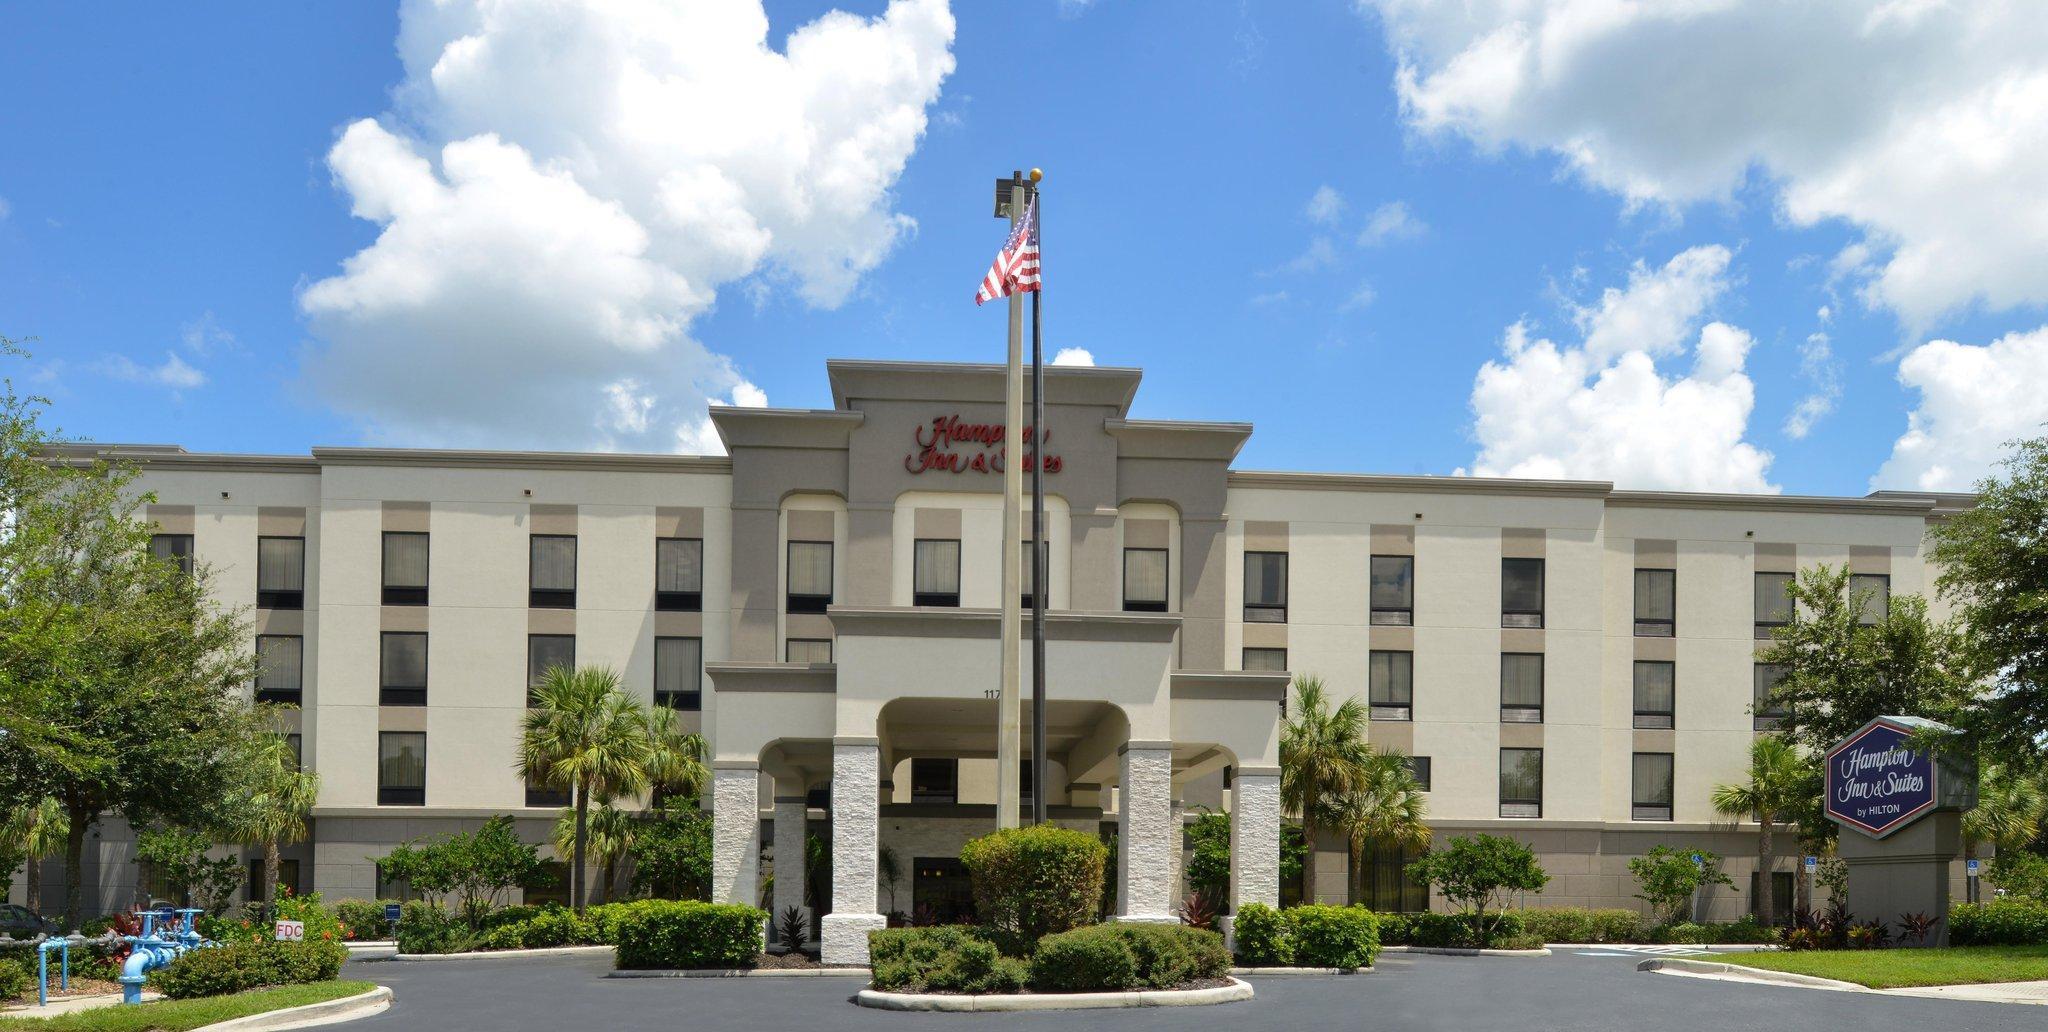 Hampton Inn And Suites Tampa East  Casino Area